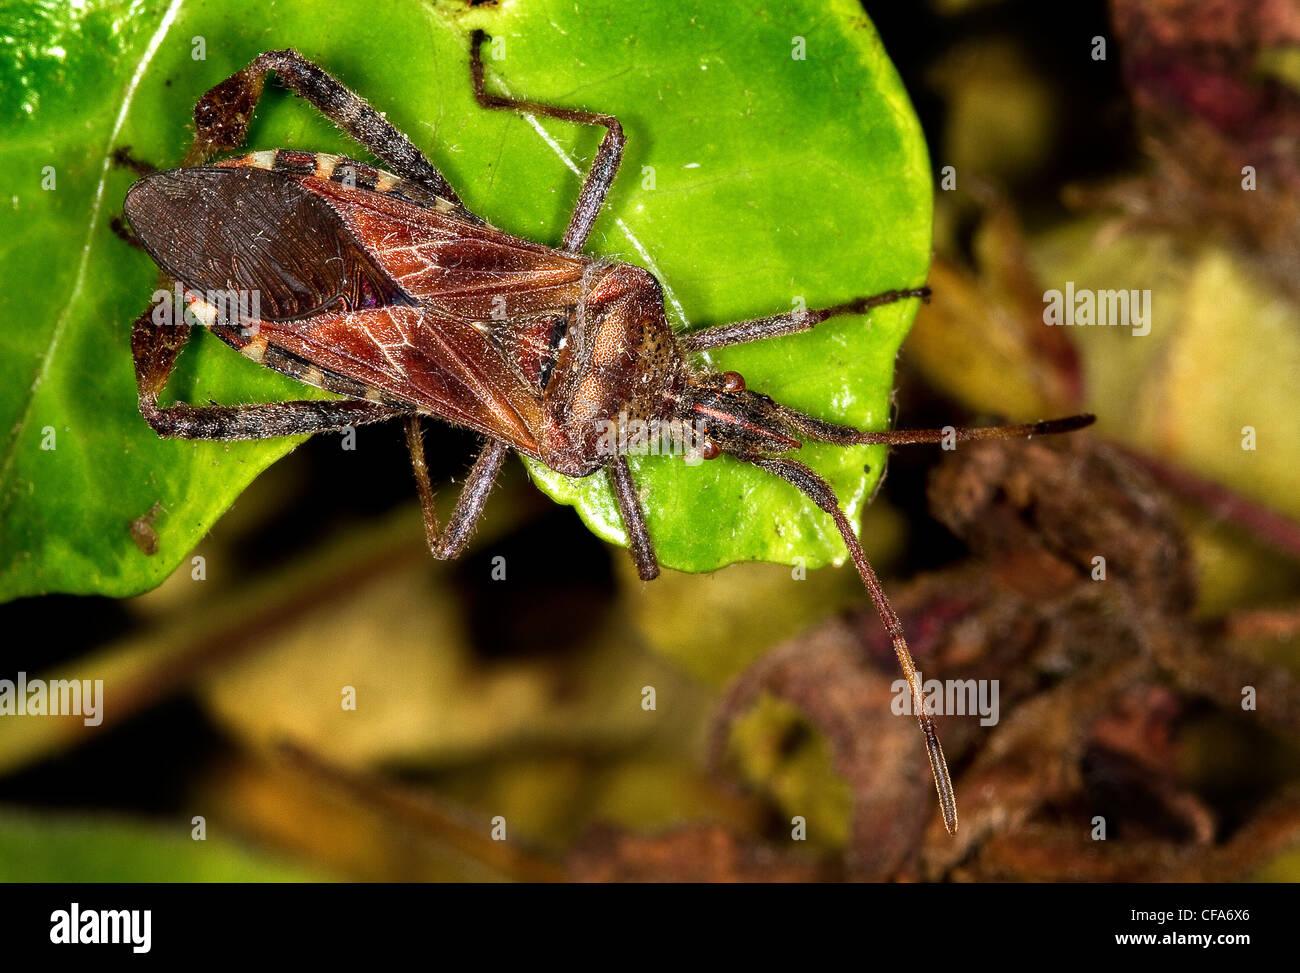 Western Conifer Seed Bug. Leptoglossus occidentalis. - Stock Image